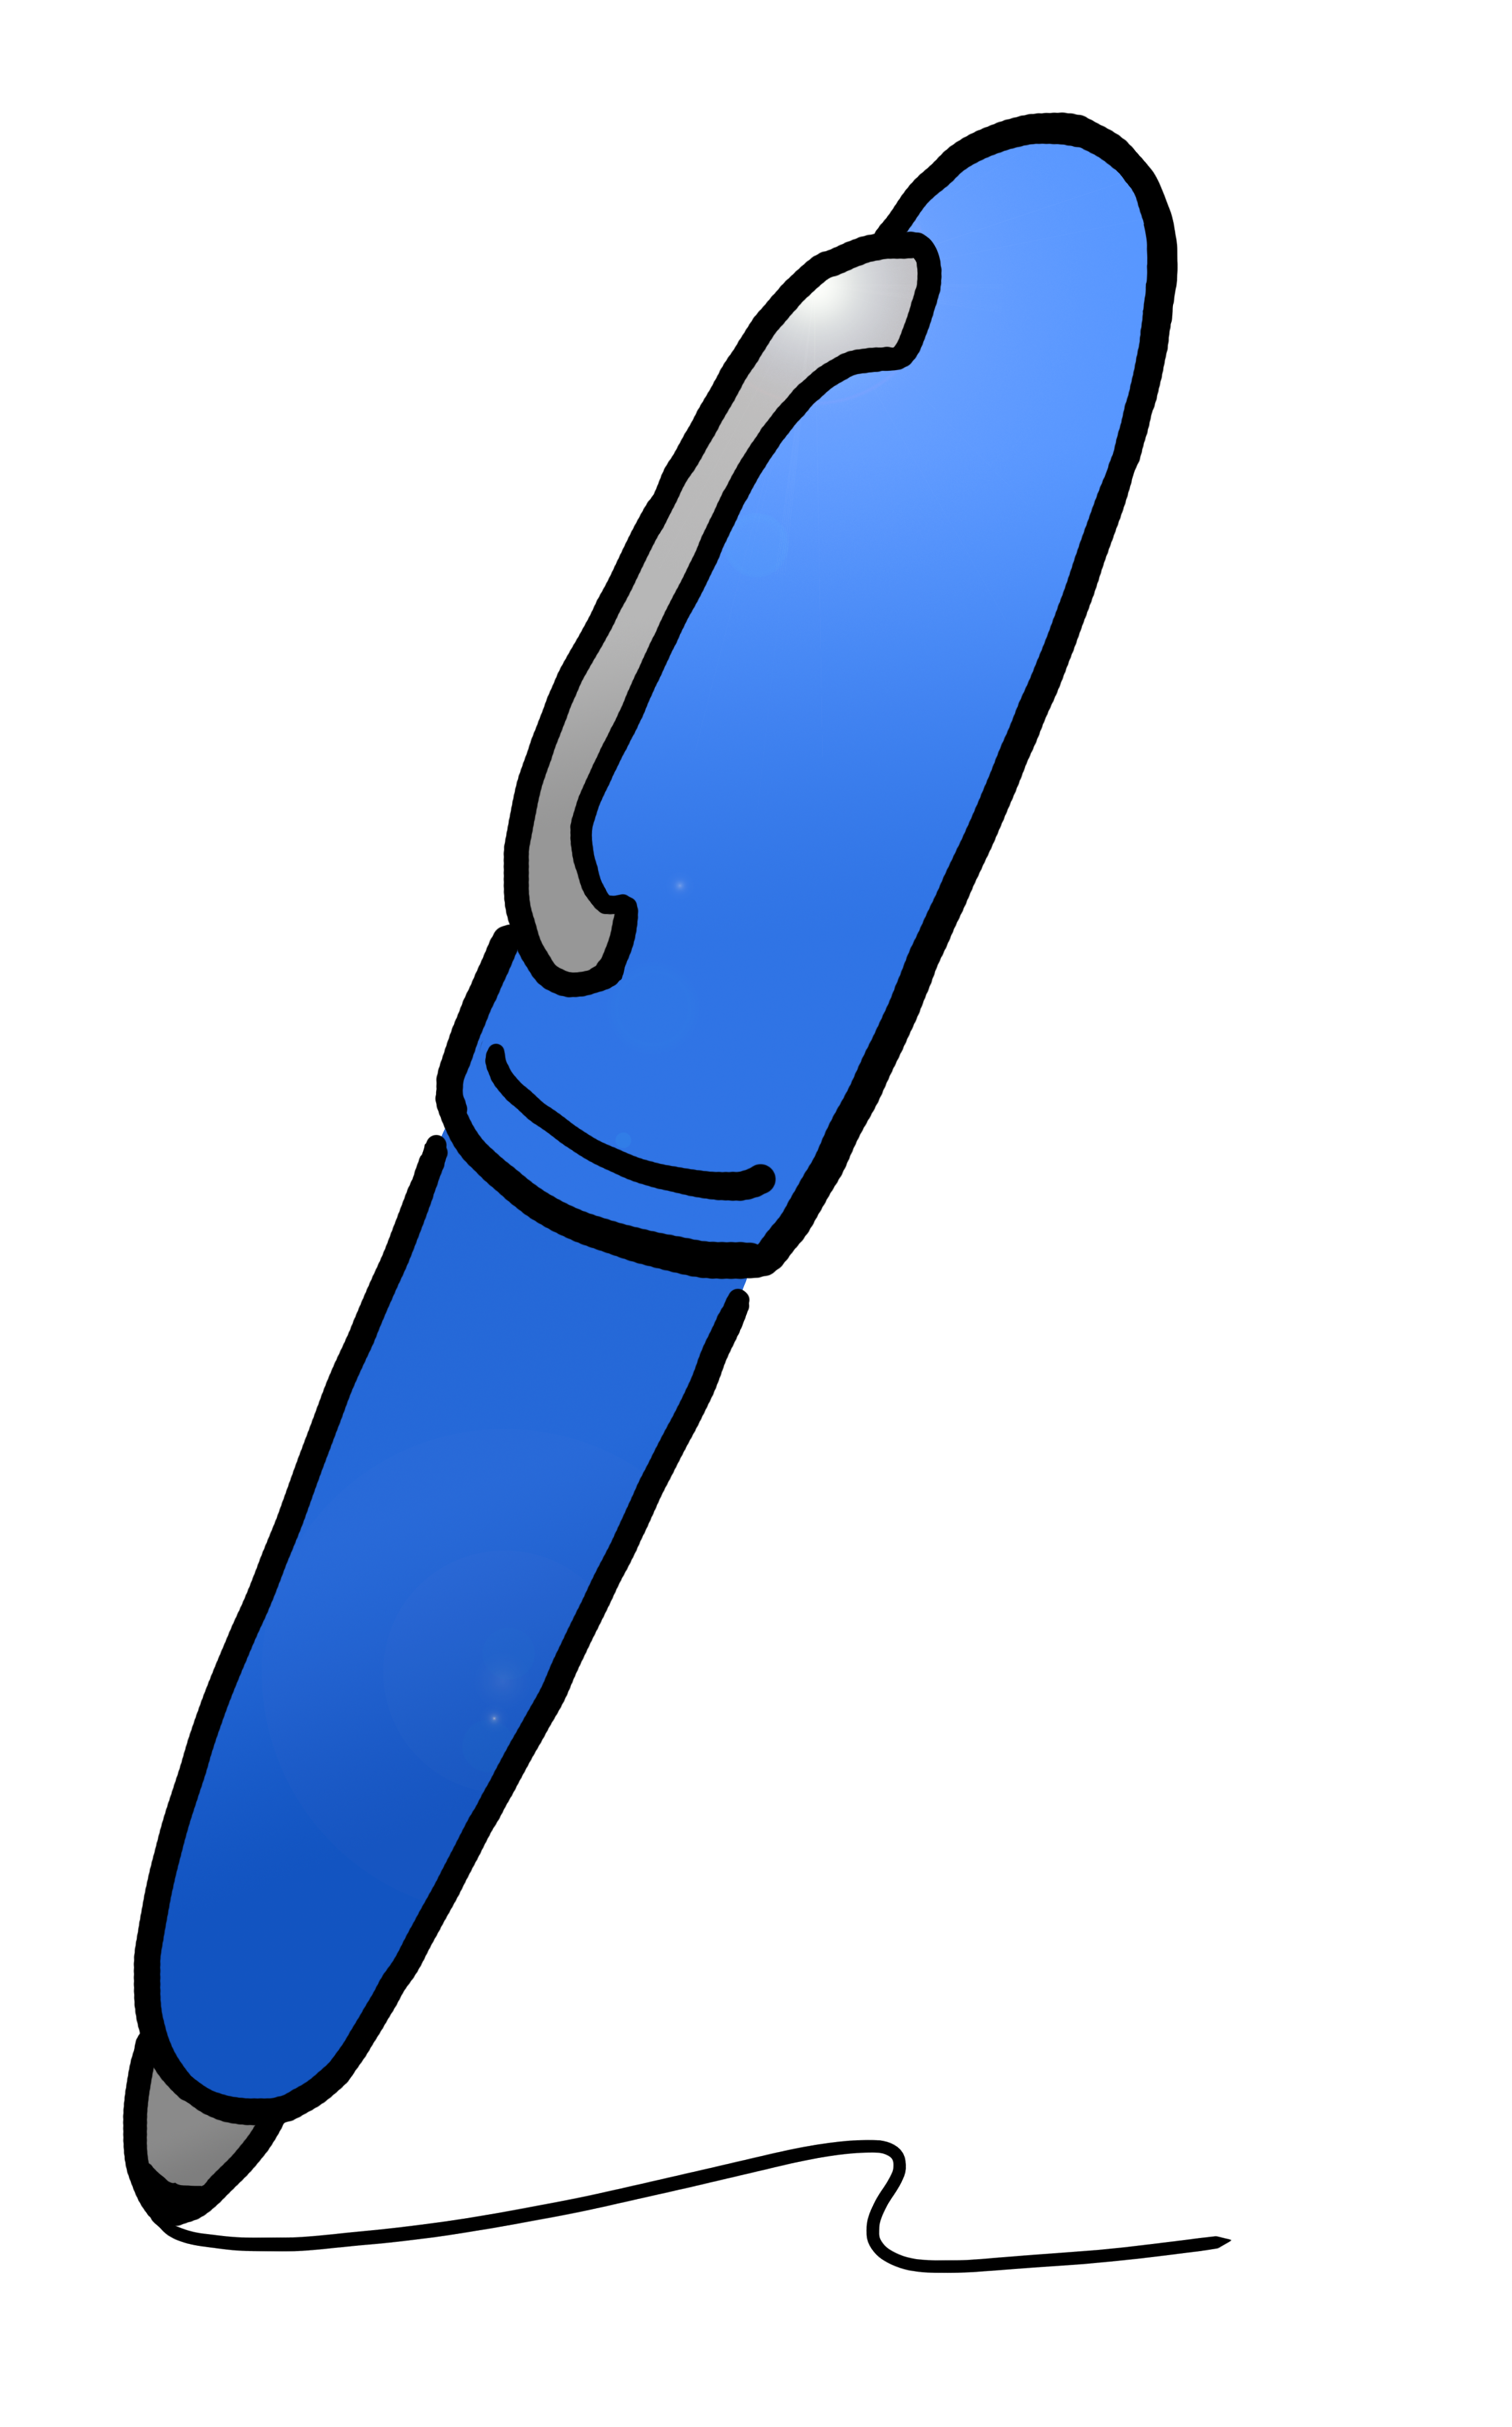 Clip Art Pen - Cliparts.co